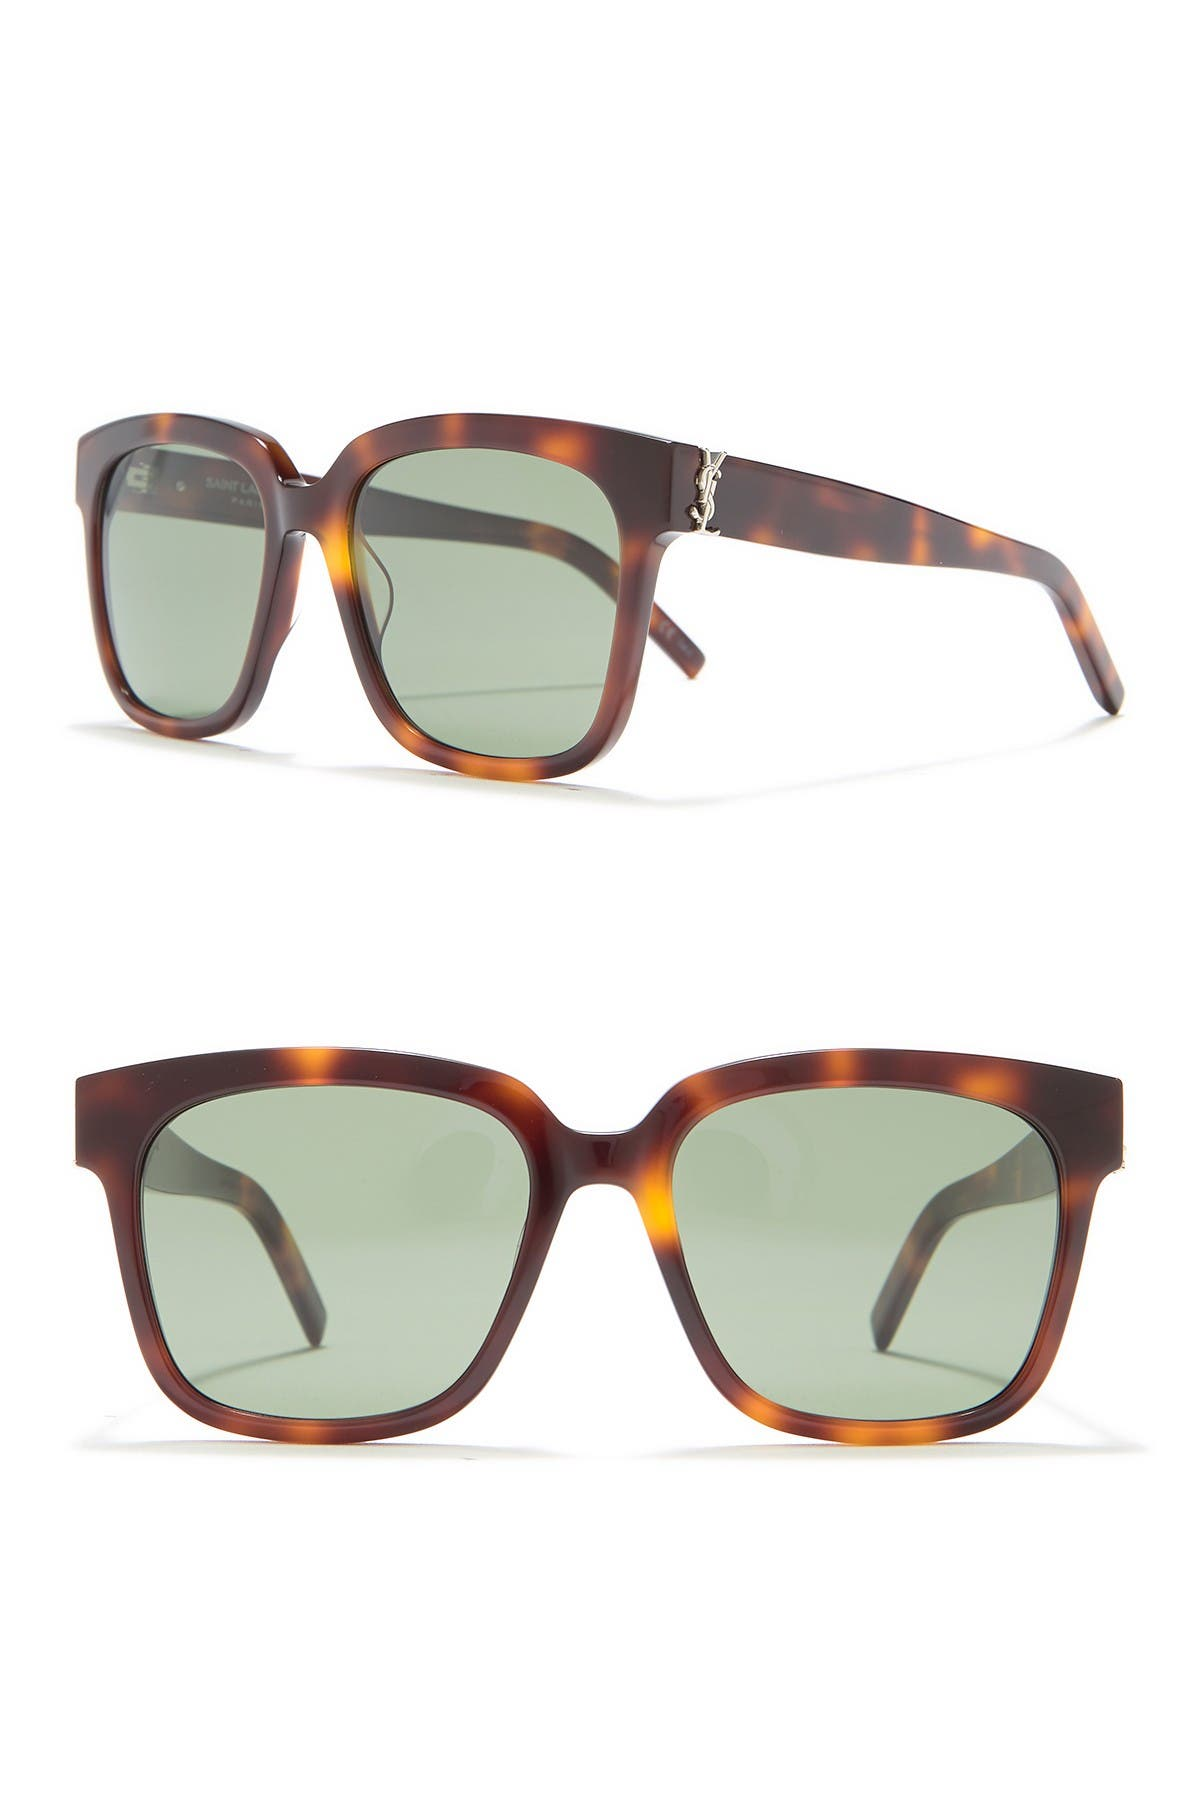 Image of Saint Laurent Square 54mm Sunglasses